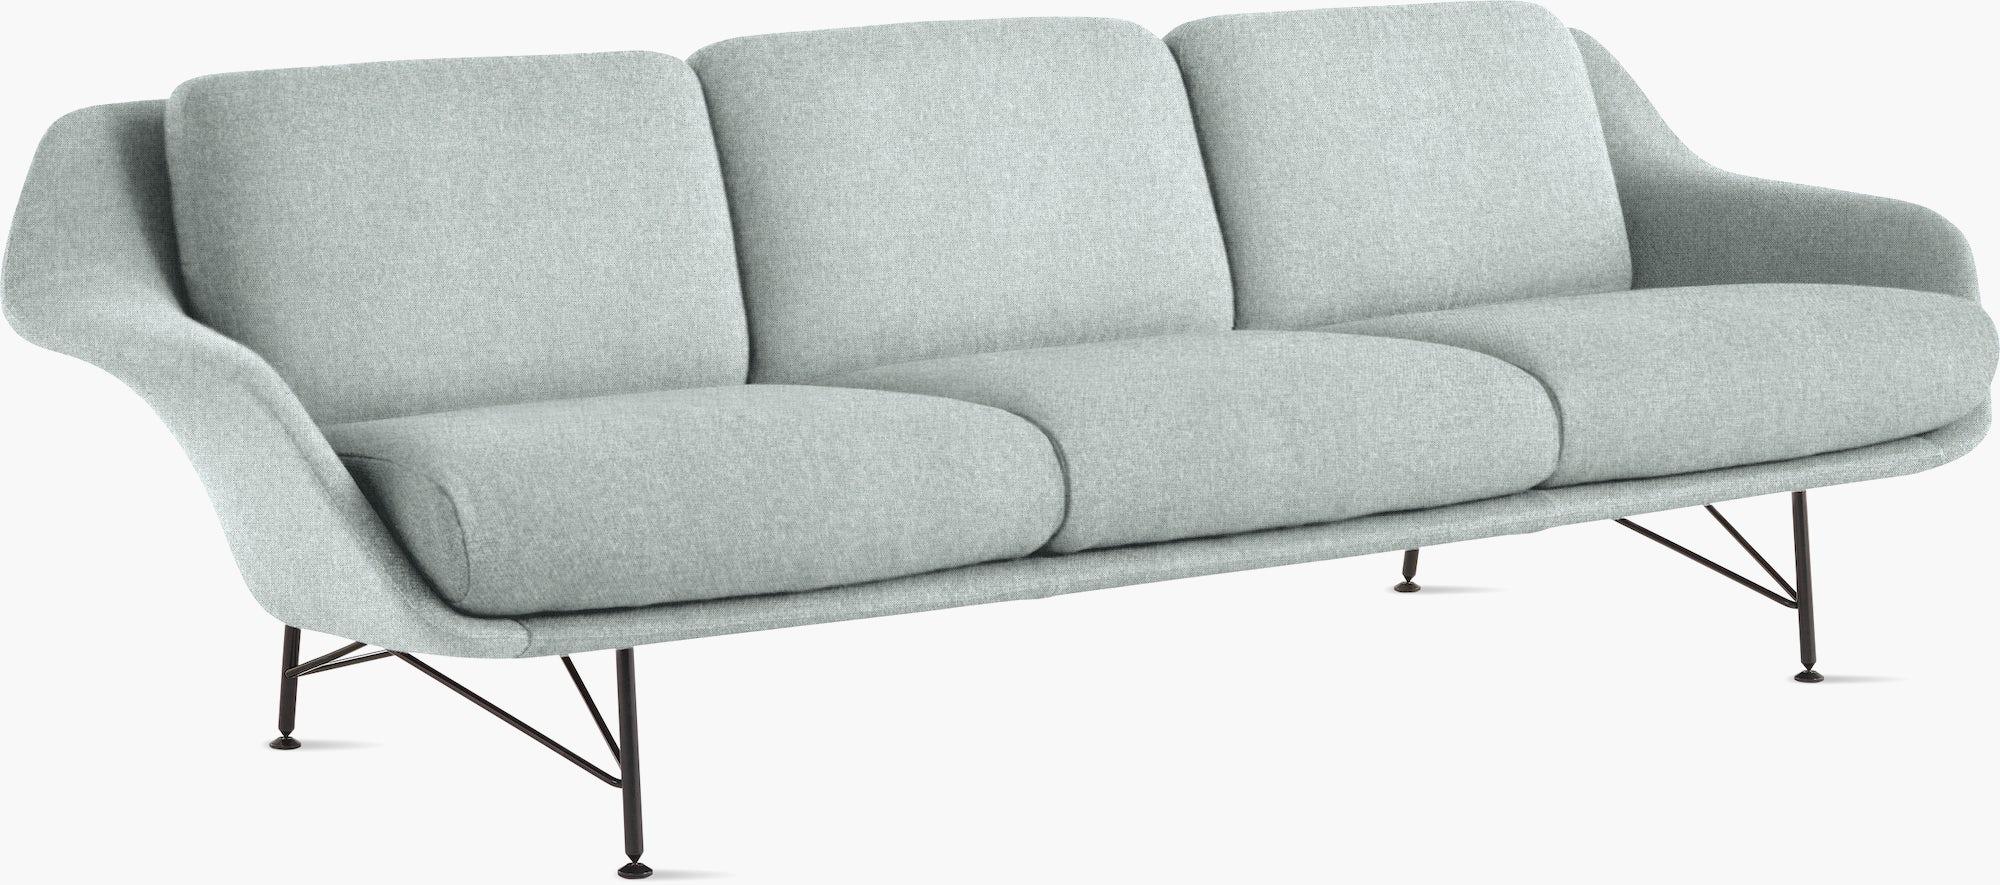 Striad Sofa Design Within Reach